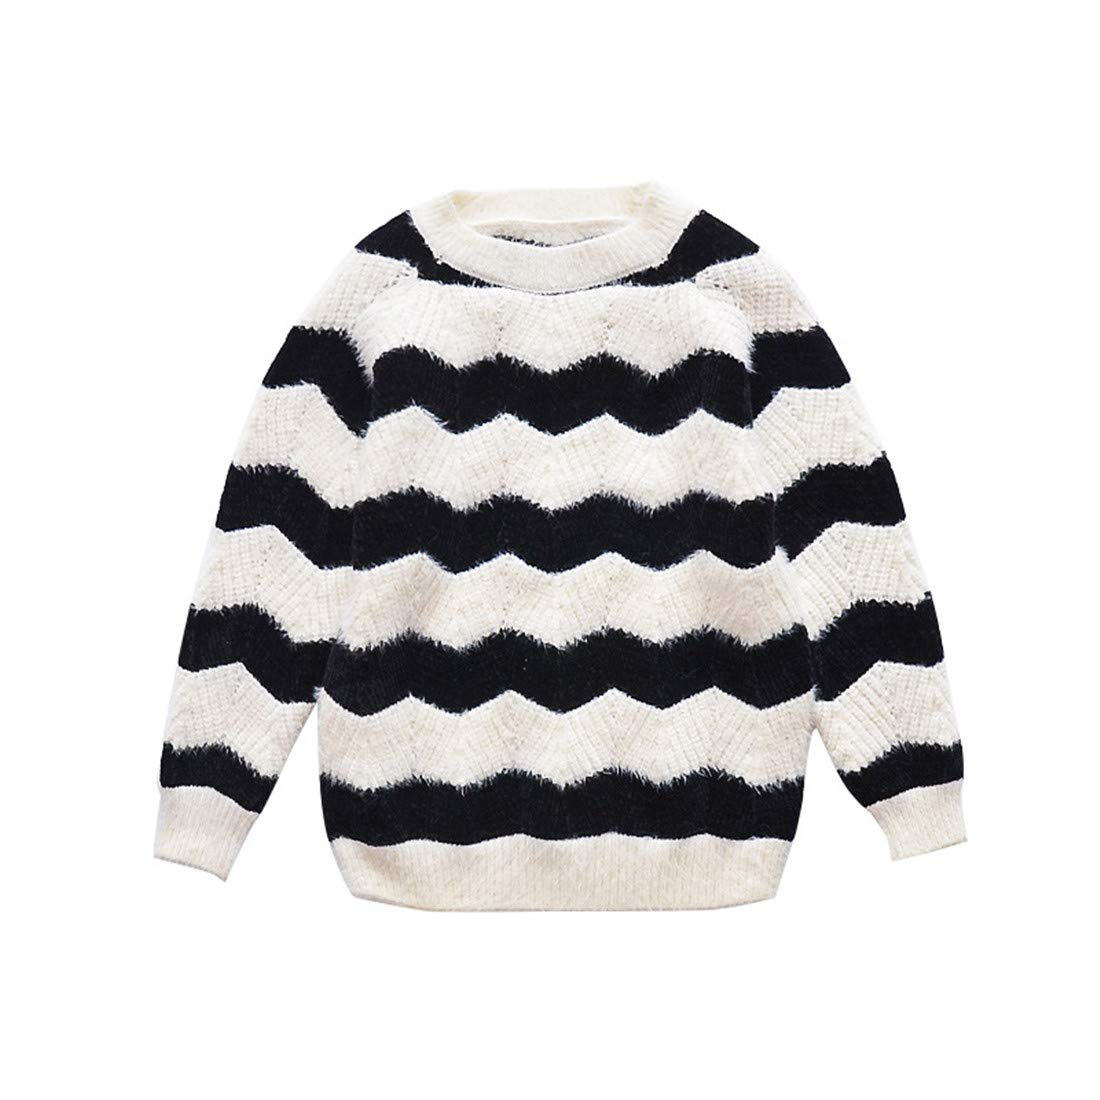 Autumn Boys Girls Sweater Imitation Hair Thickening Plush Sweater Sports Striped